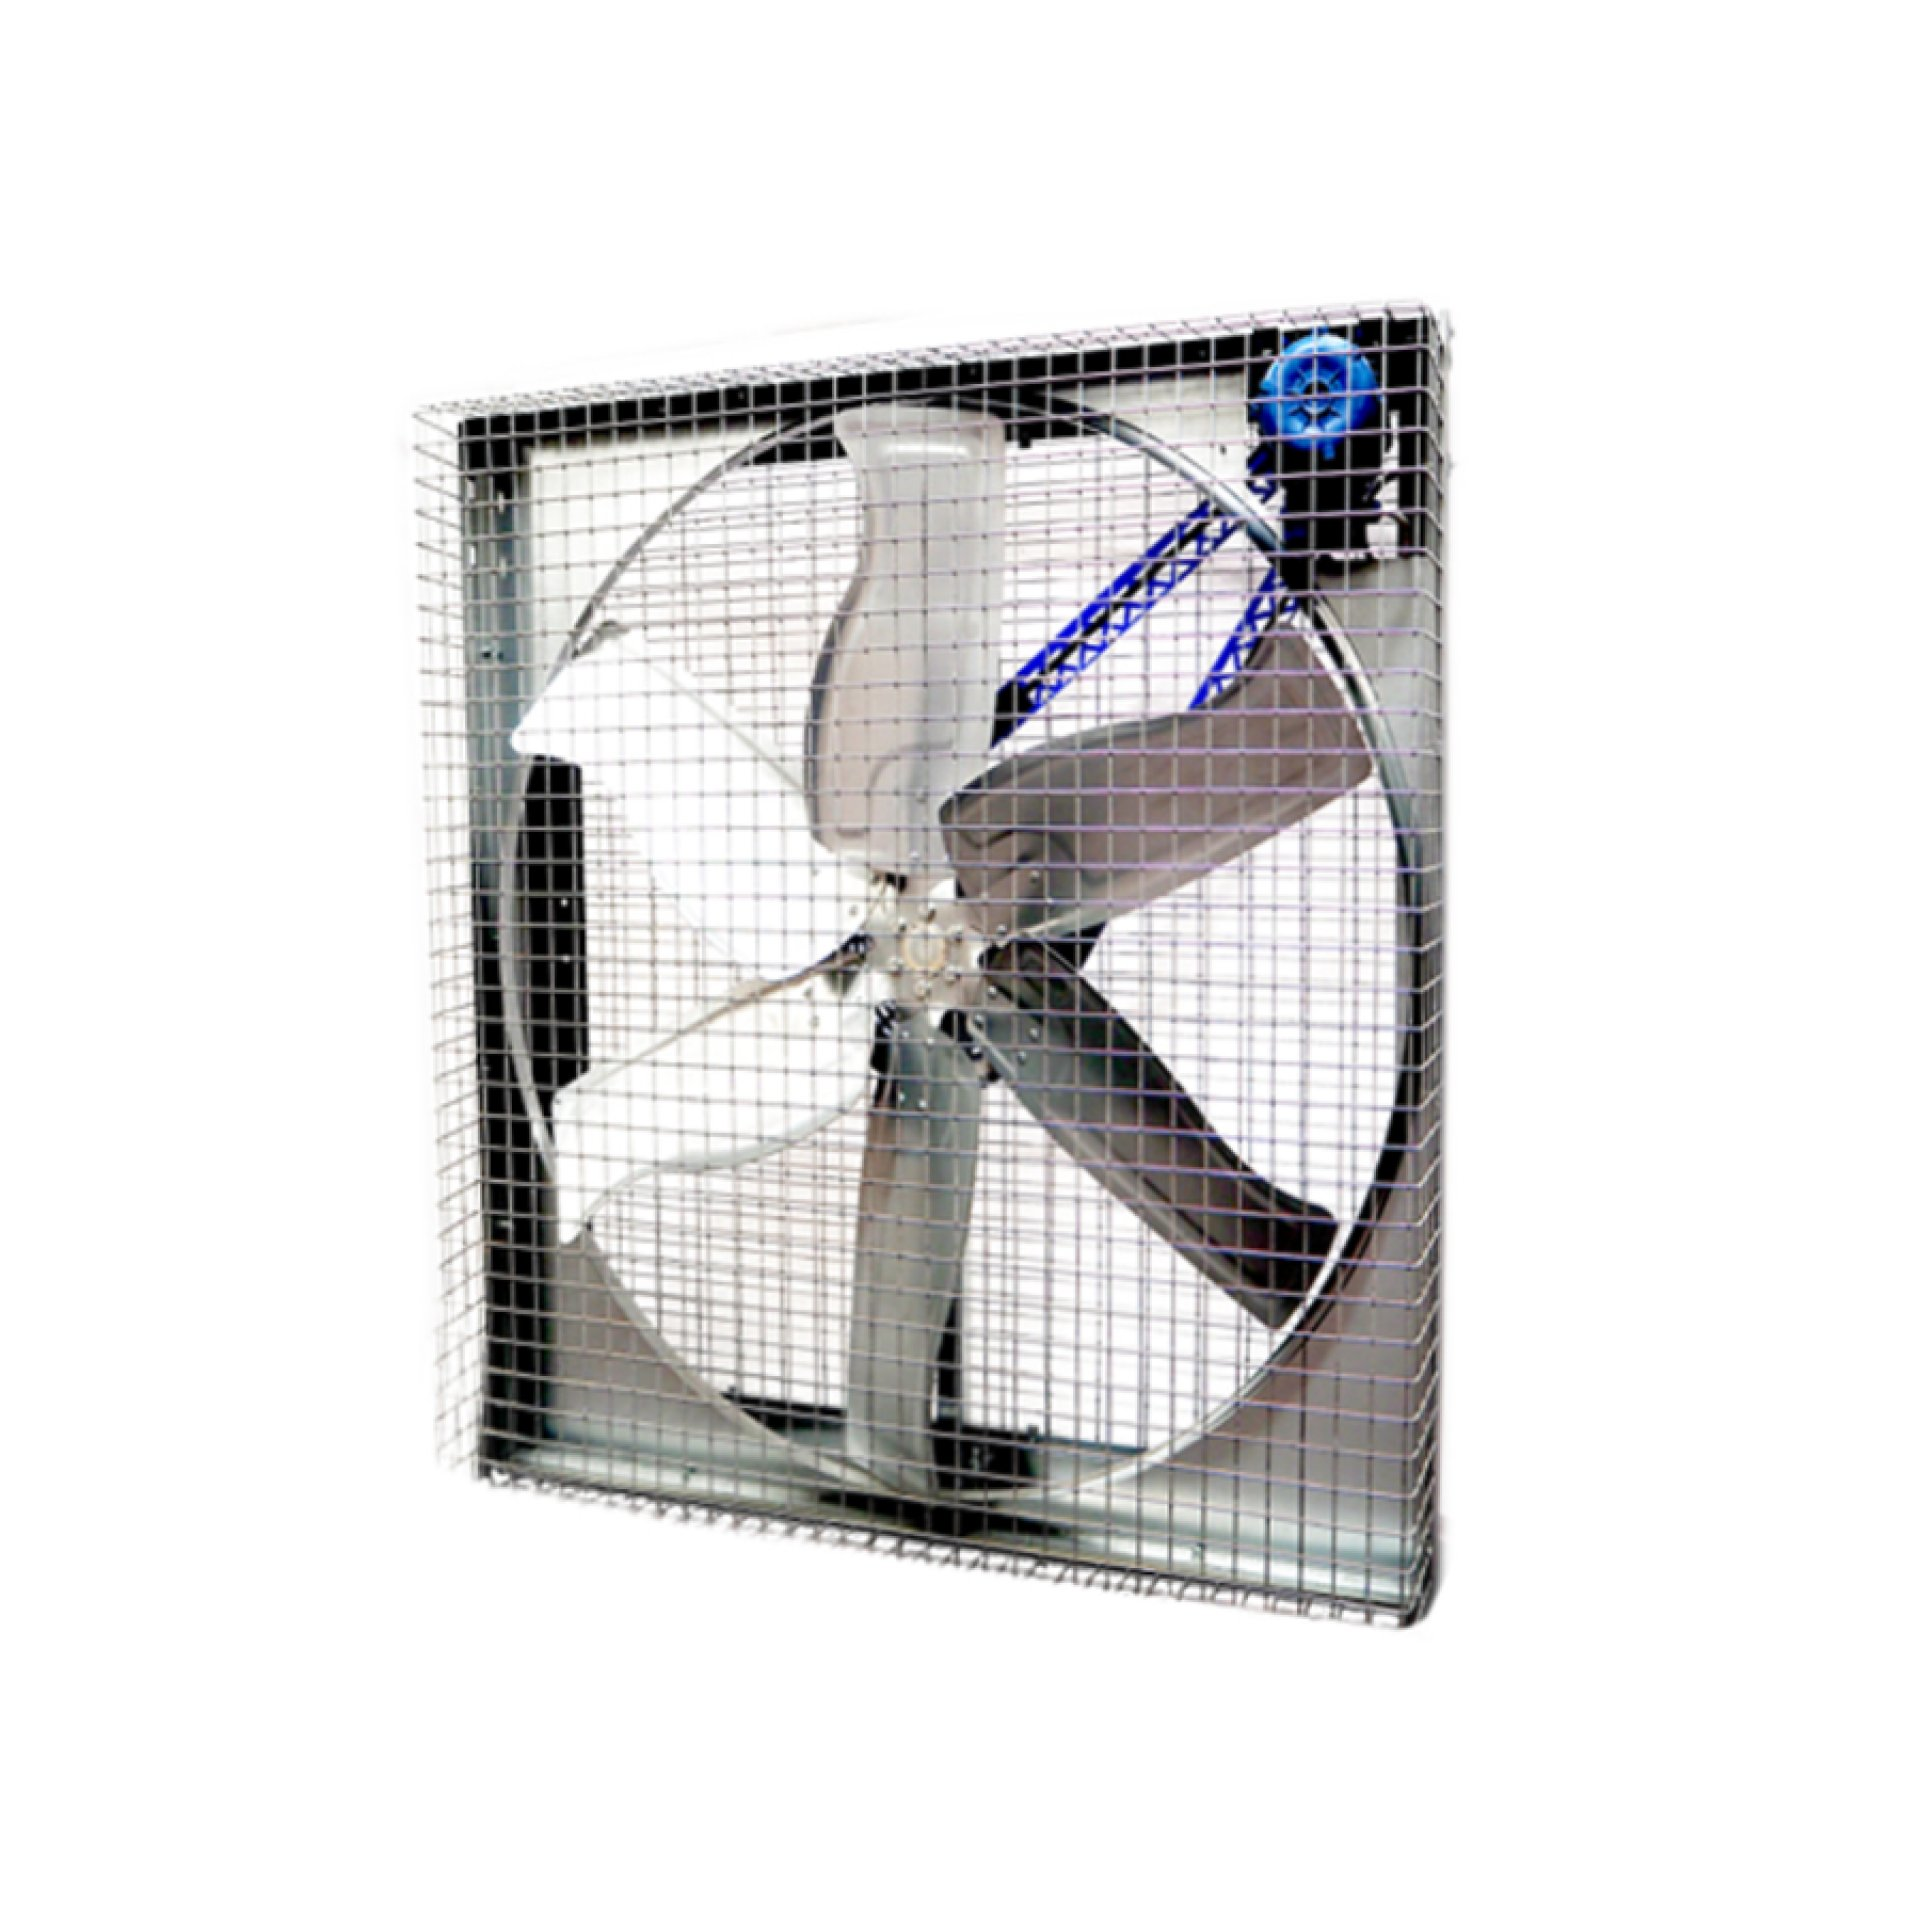 1270-narrow-case-sequential-wire-ventilation-fan